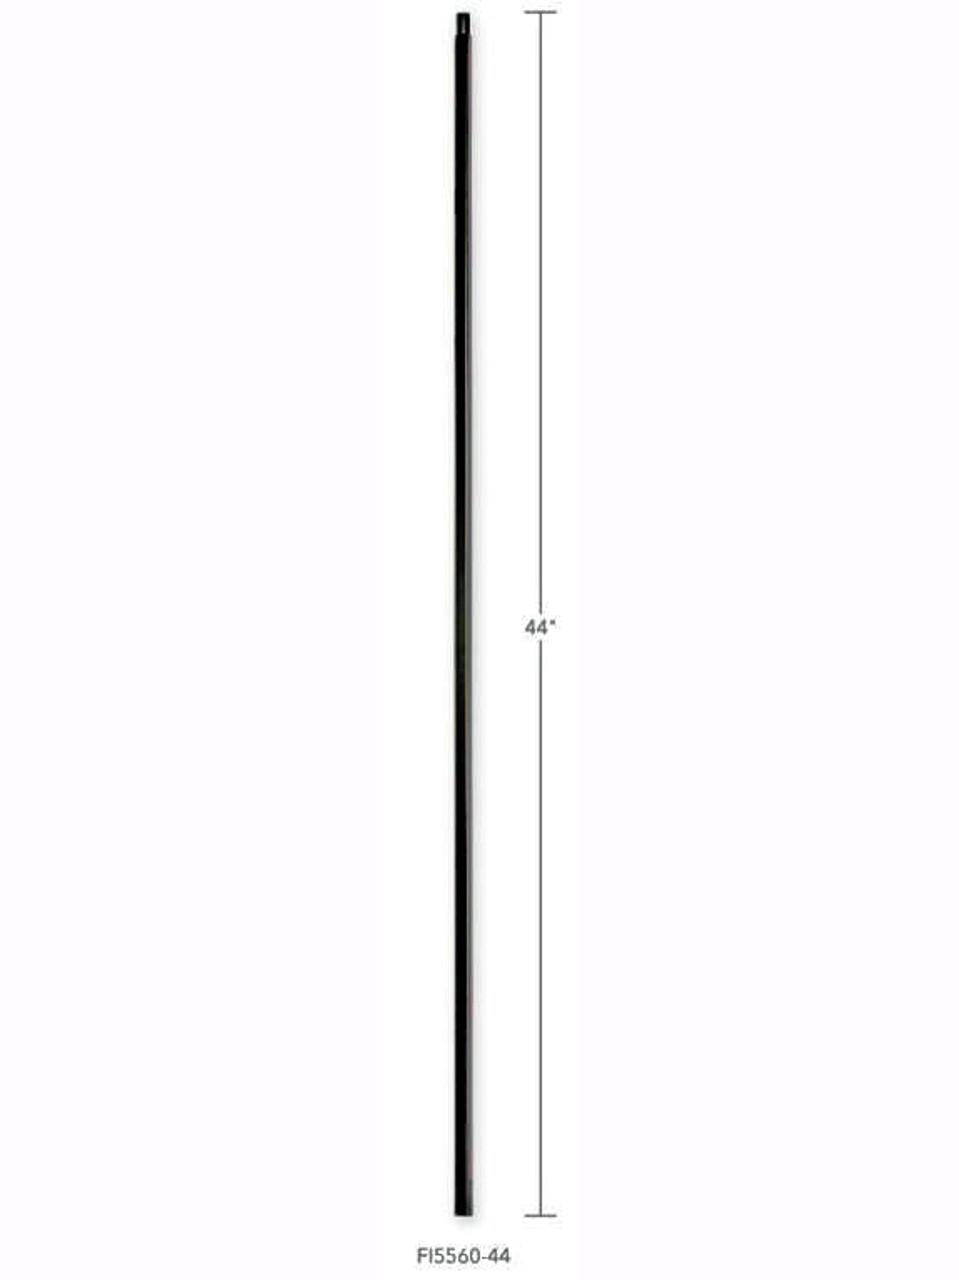 FIH5560-44 Hollow Plain Bar Baluster